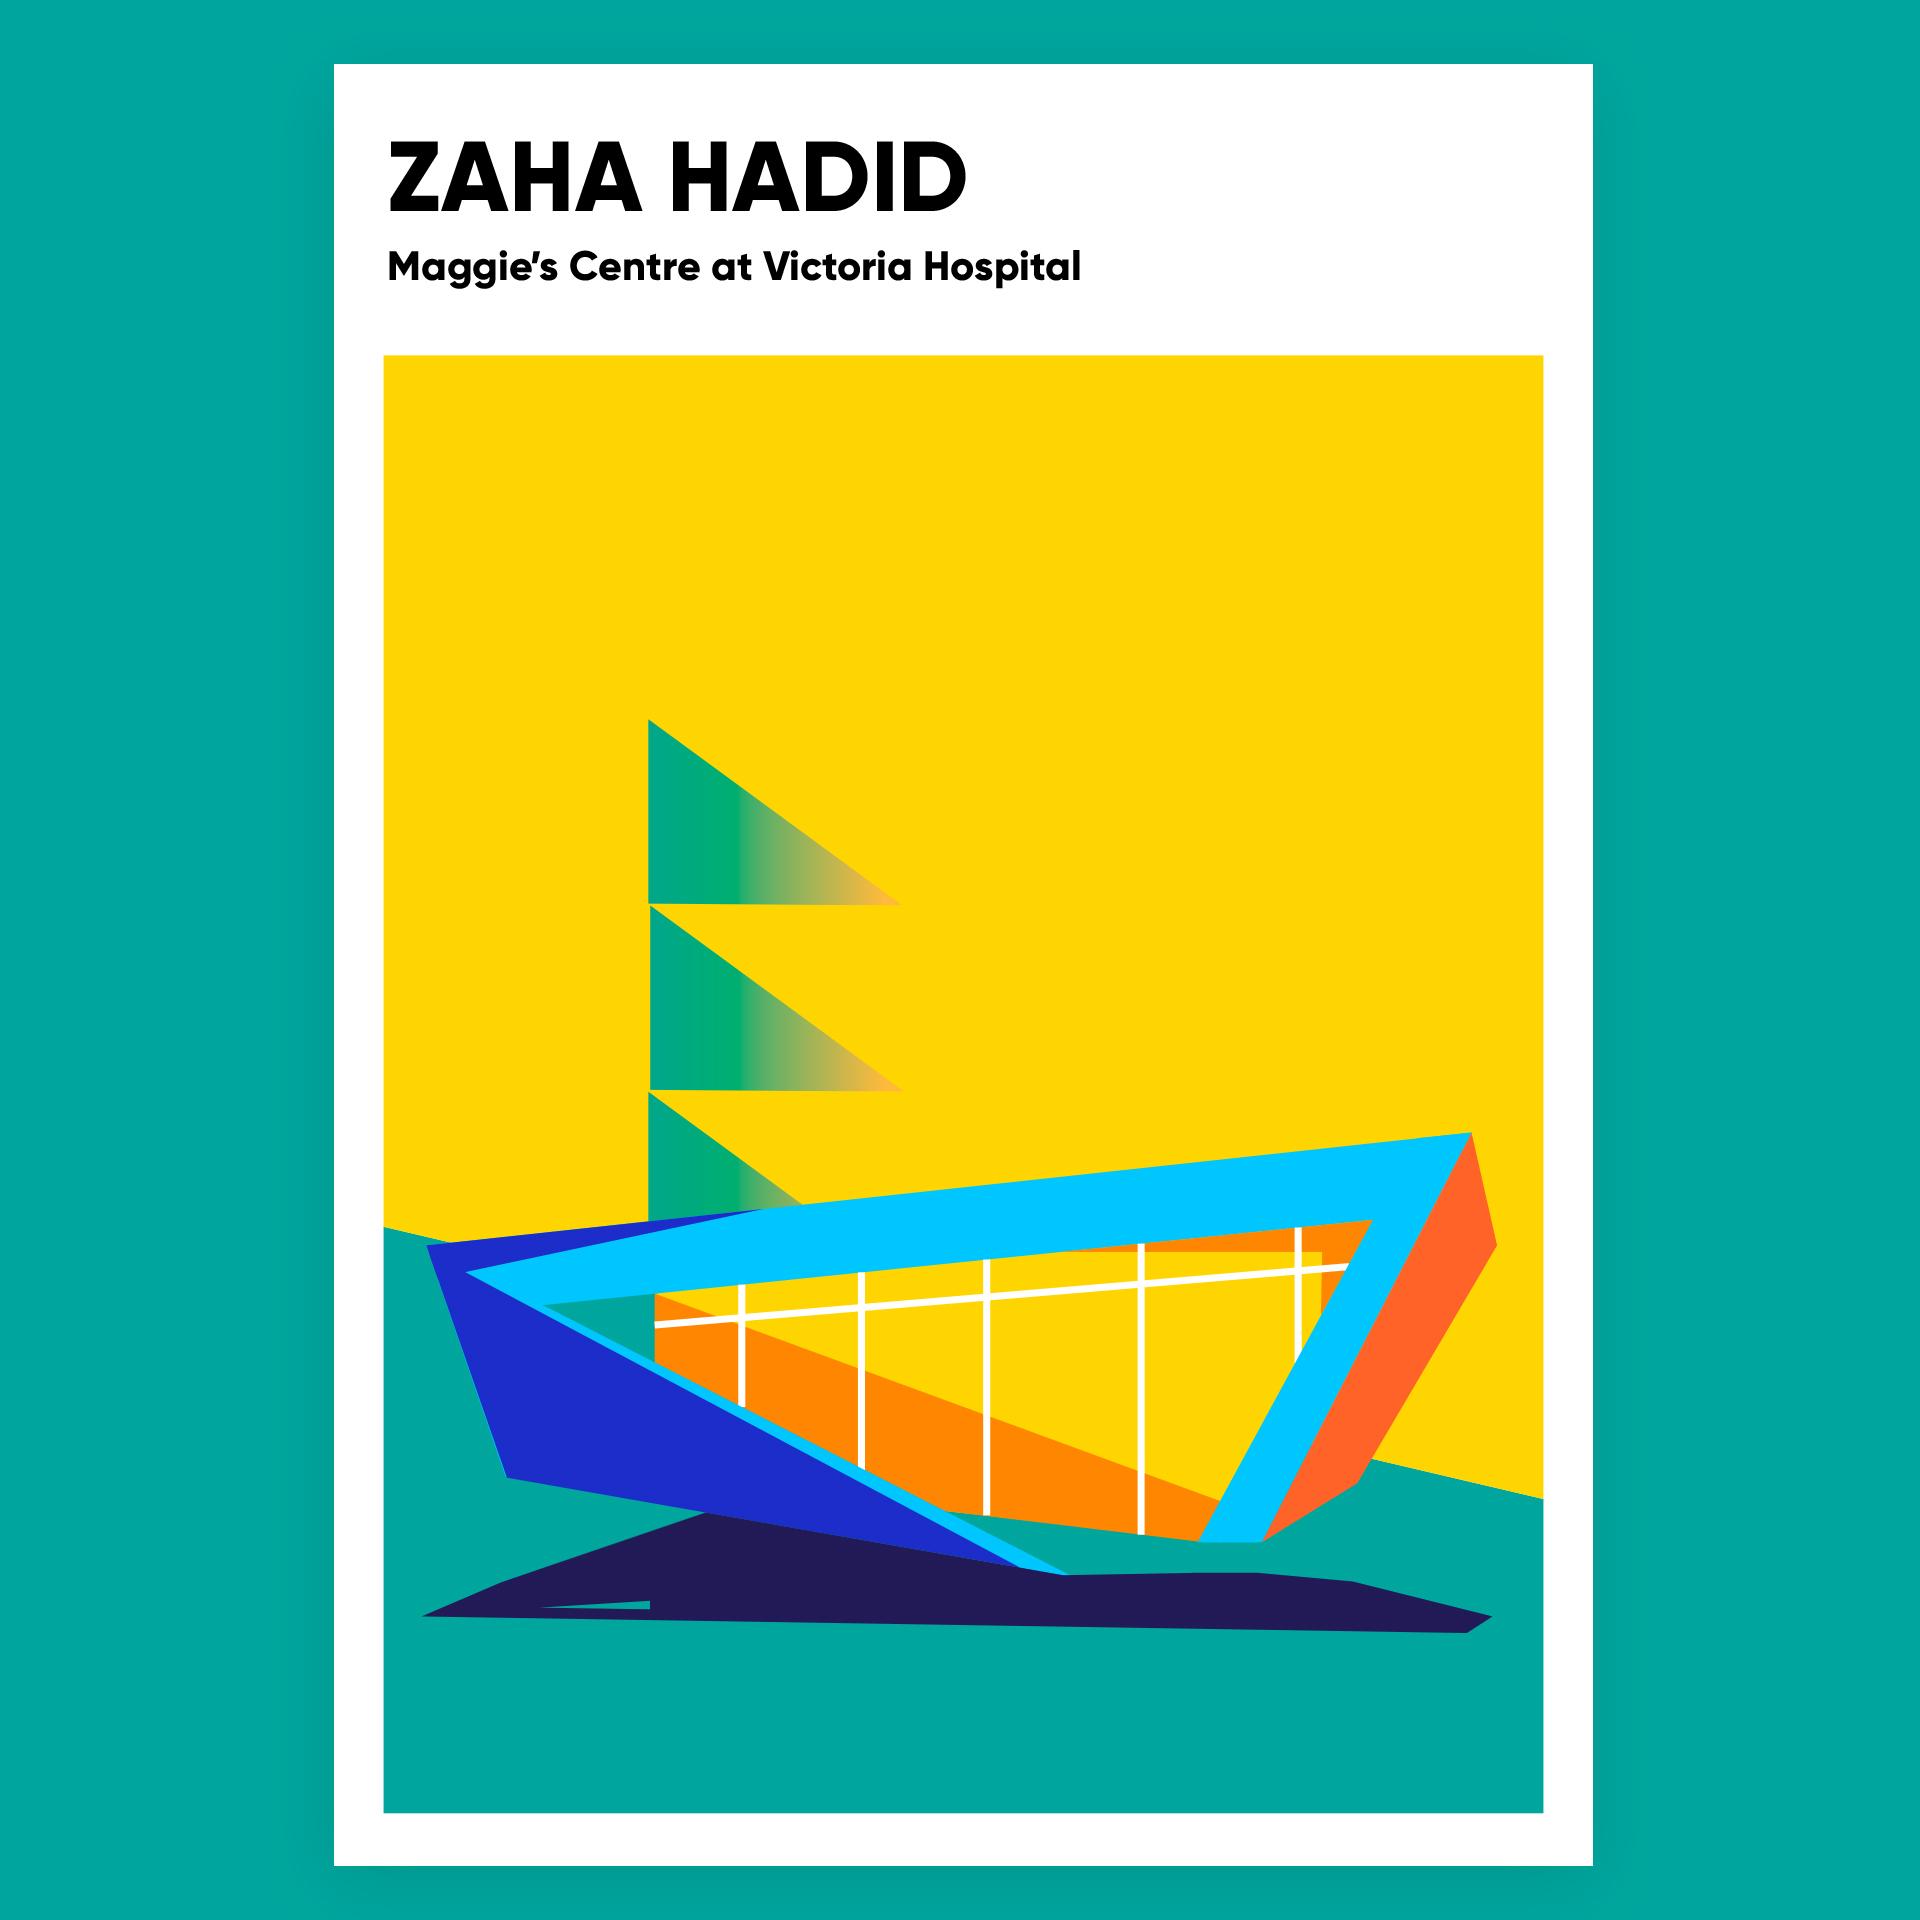 idesign zahahadid 05